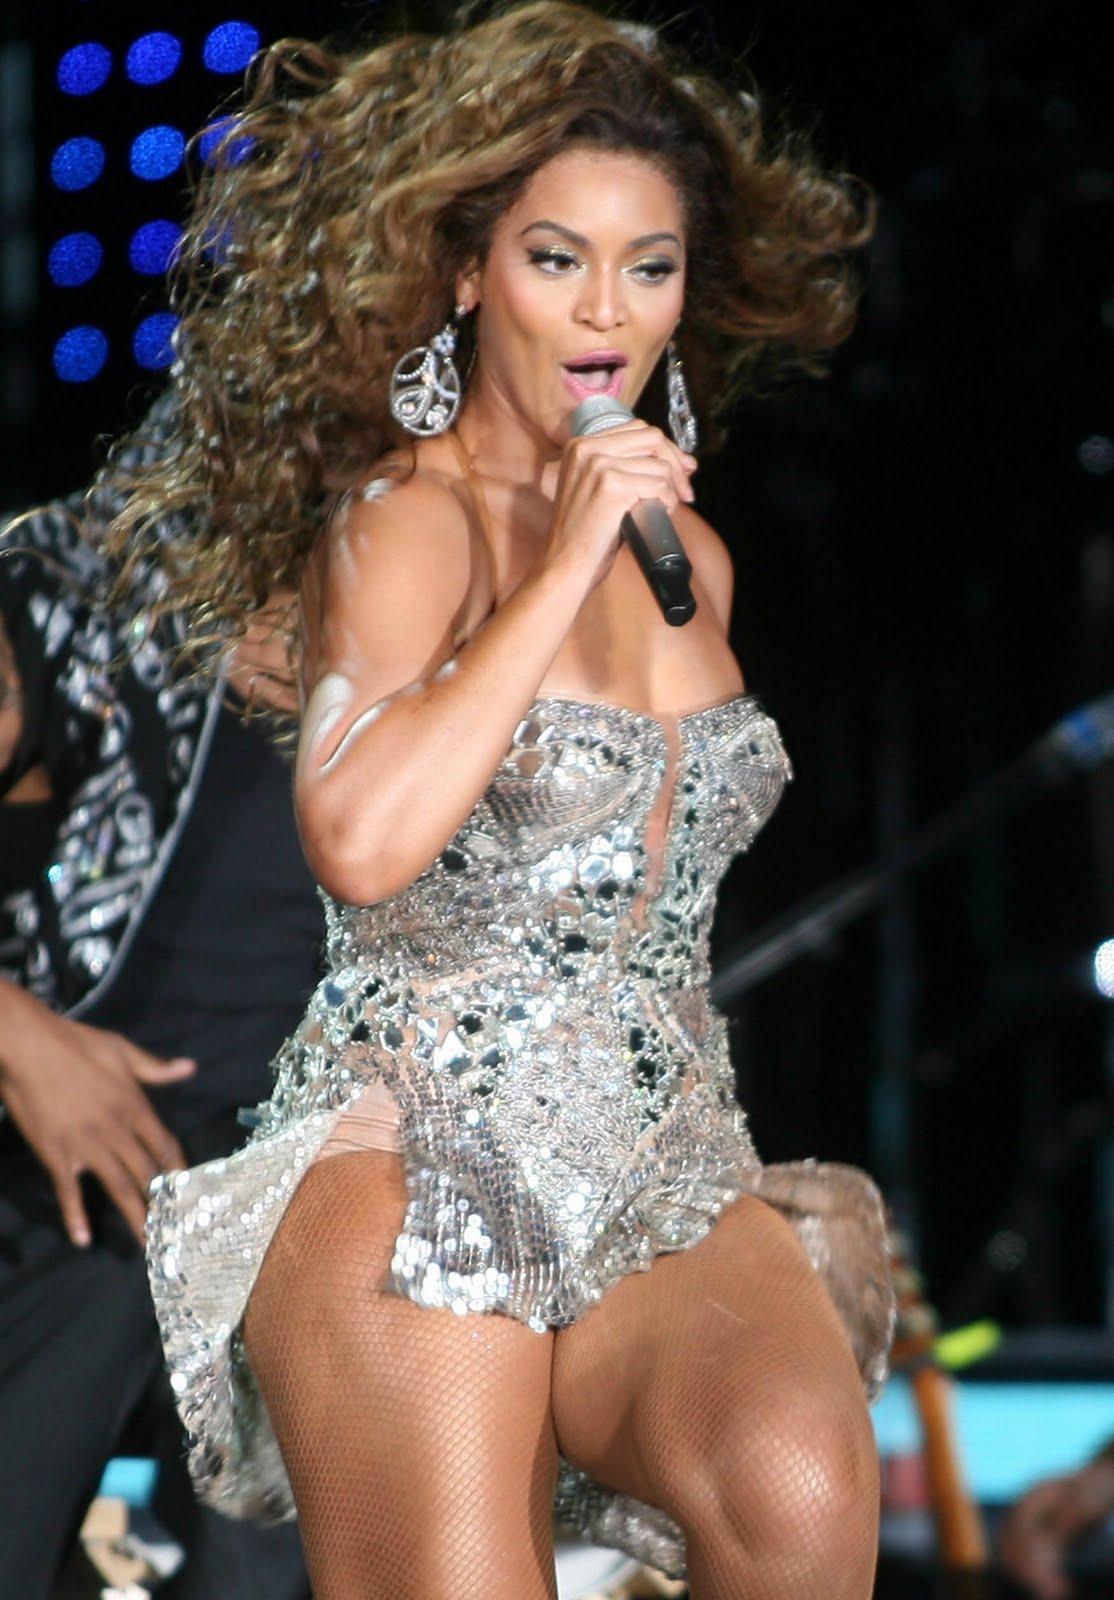 http://1.bp.blogspot.com/_csogD6ptEnI/SwOwsMn_ROI/AAAAAAAAD08/JfjeuWzri3I/s1600/Beyonce_Knowles_10.jpg